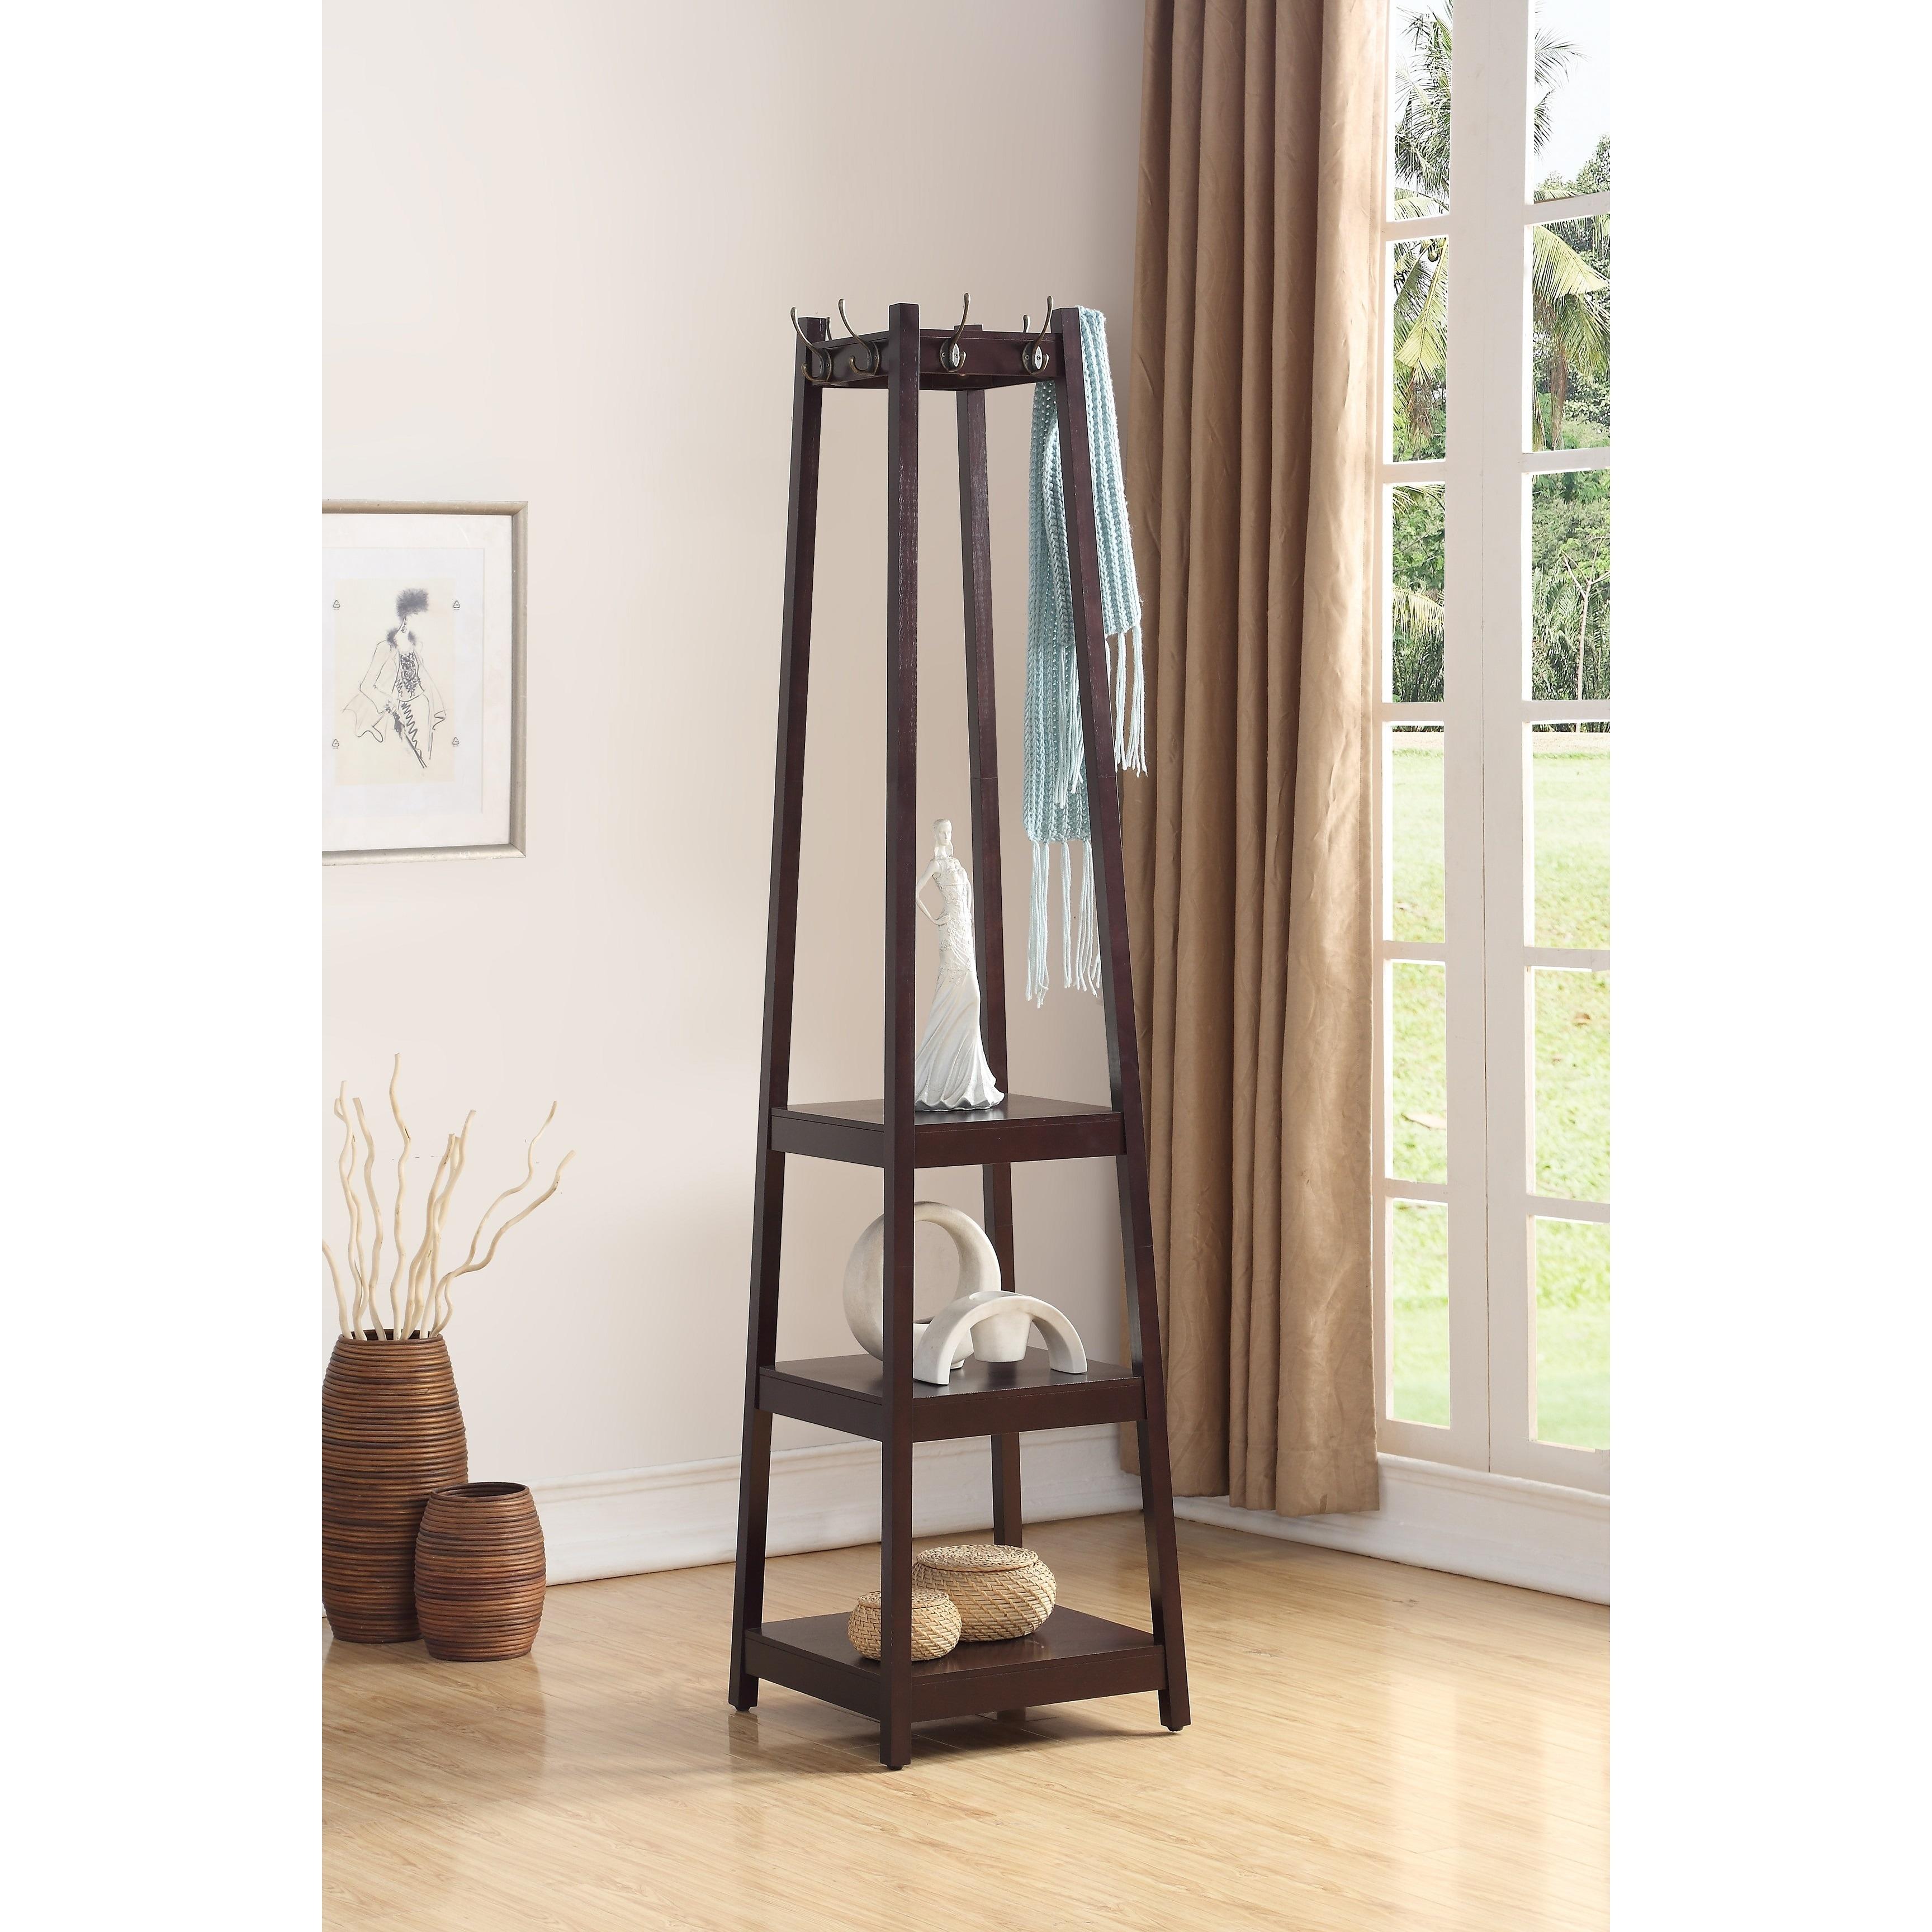 info hrcouncil rack standing design depot wooden coat tree target uk stand wood home